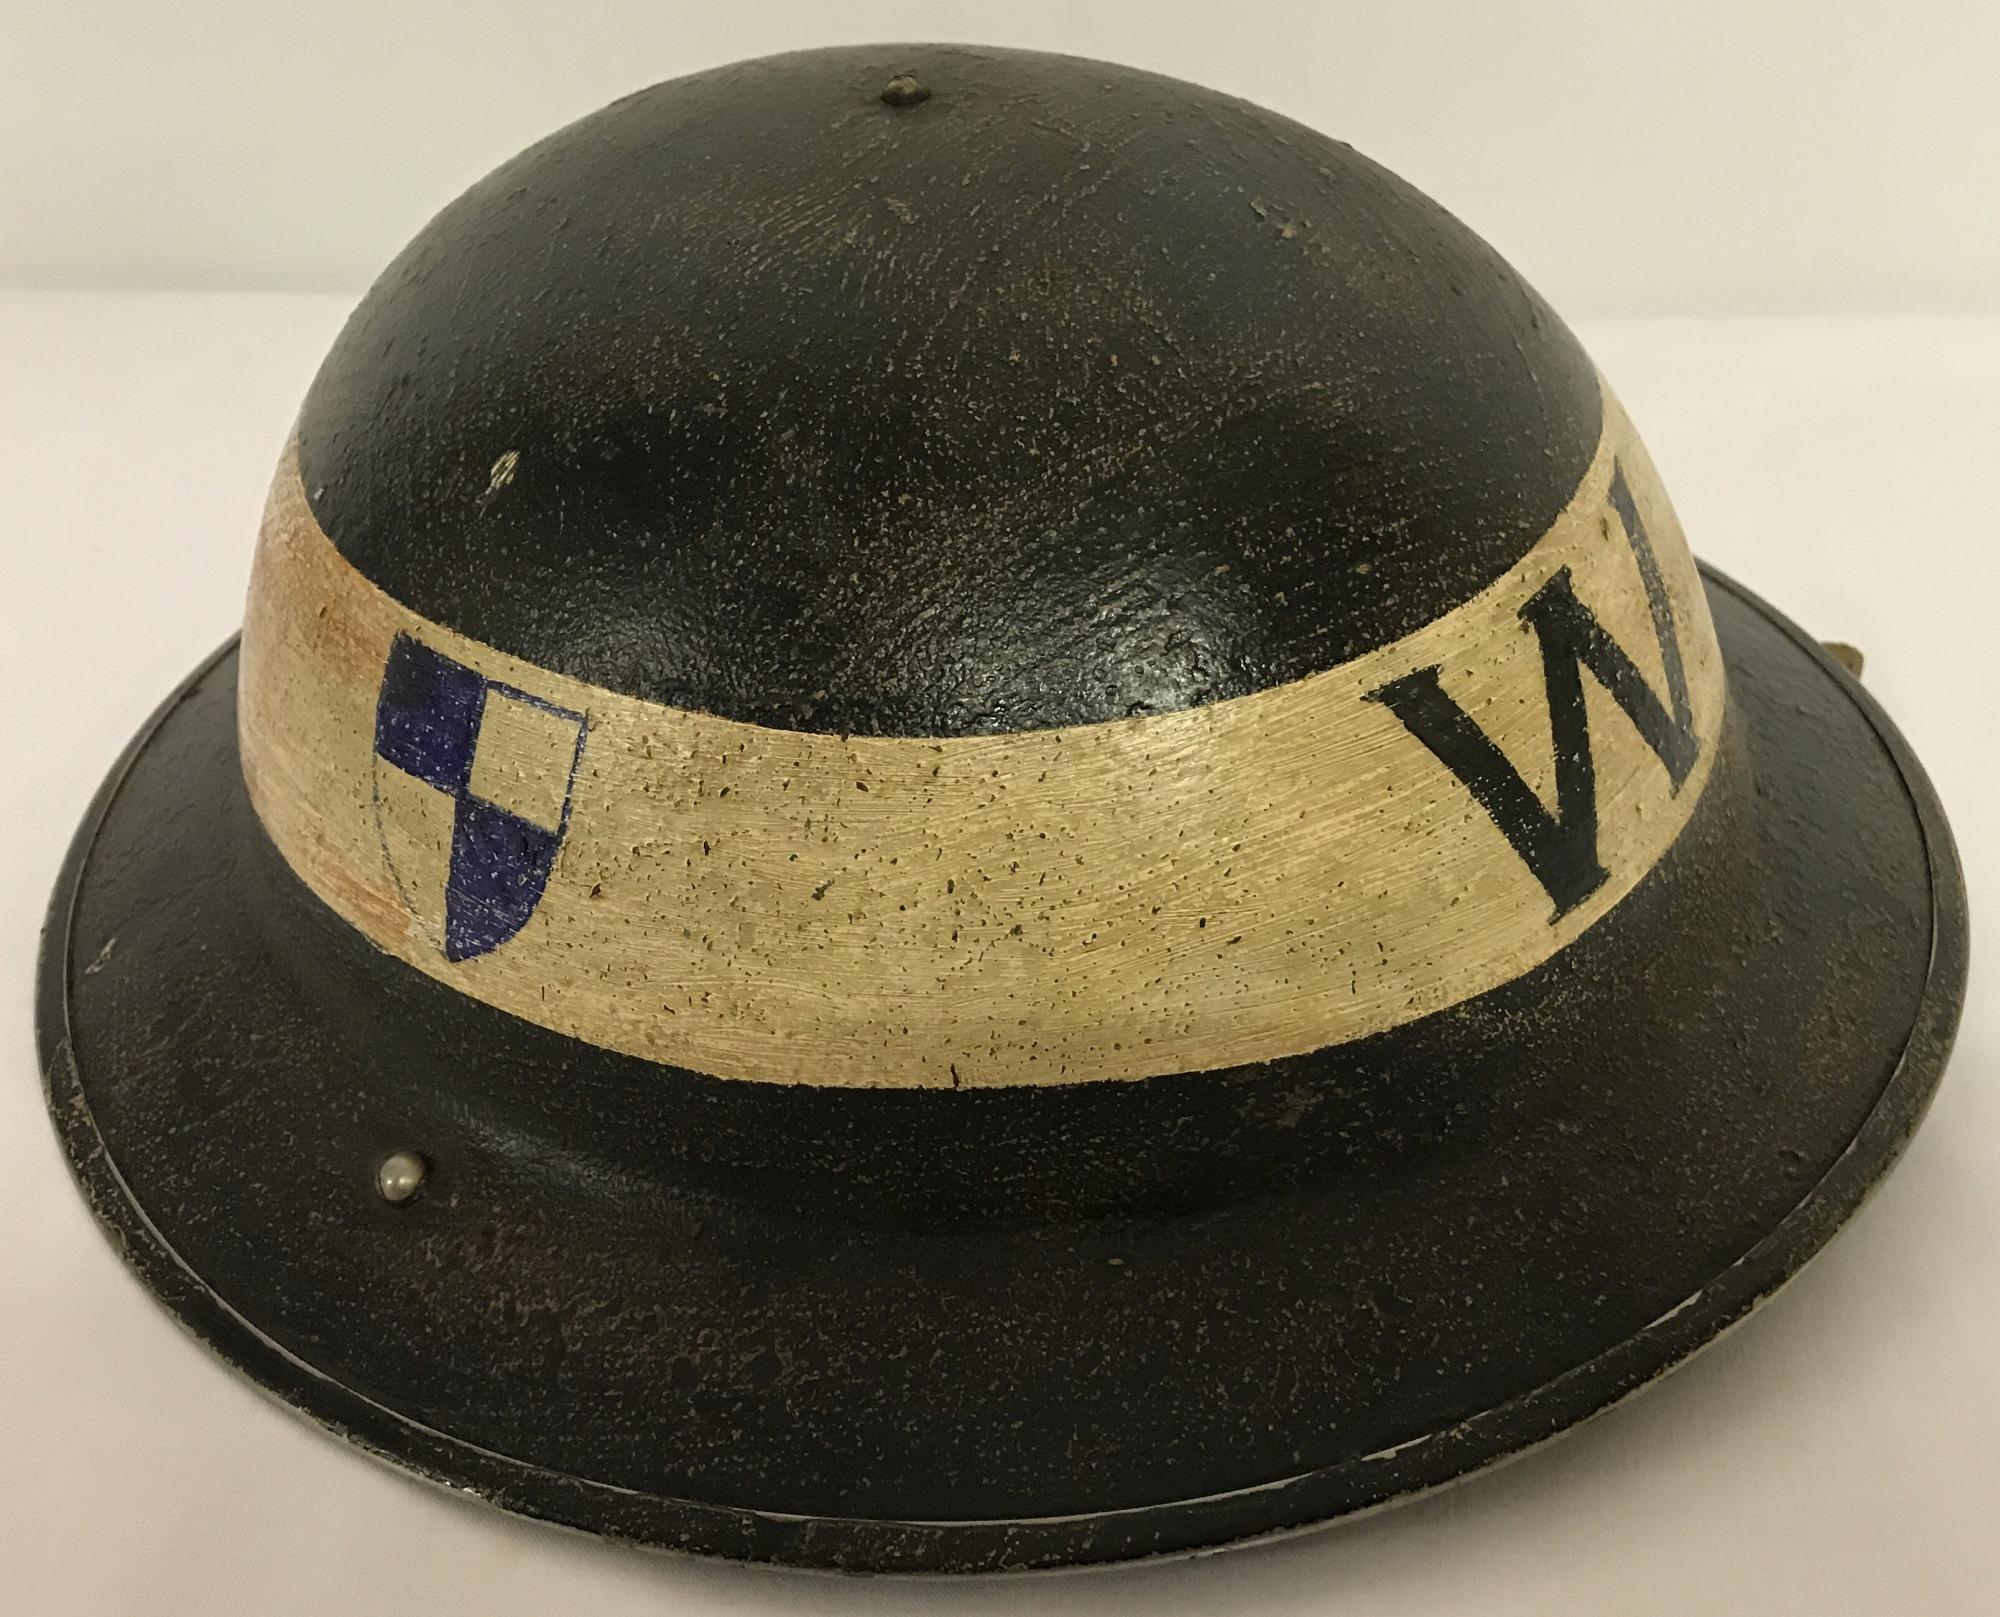 Lot 221 - A British MK II Civil Defence/Home Front steel helmet c1939.